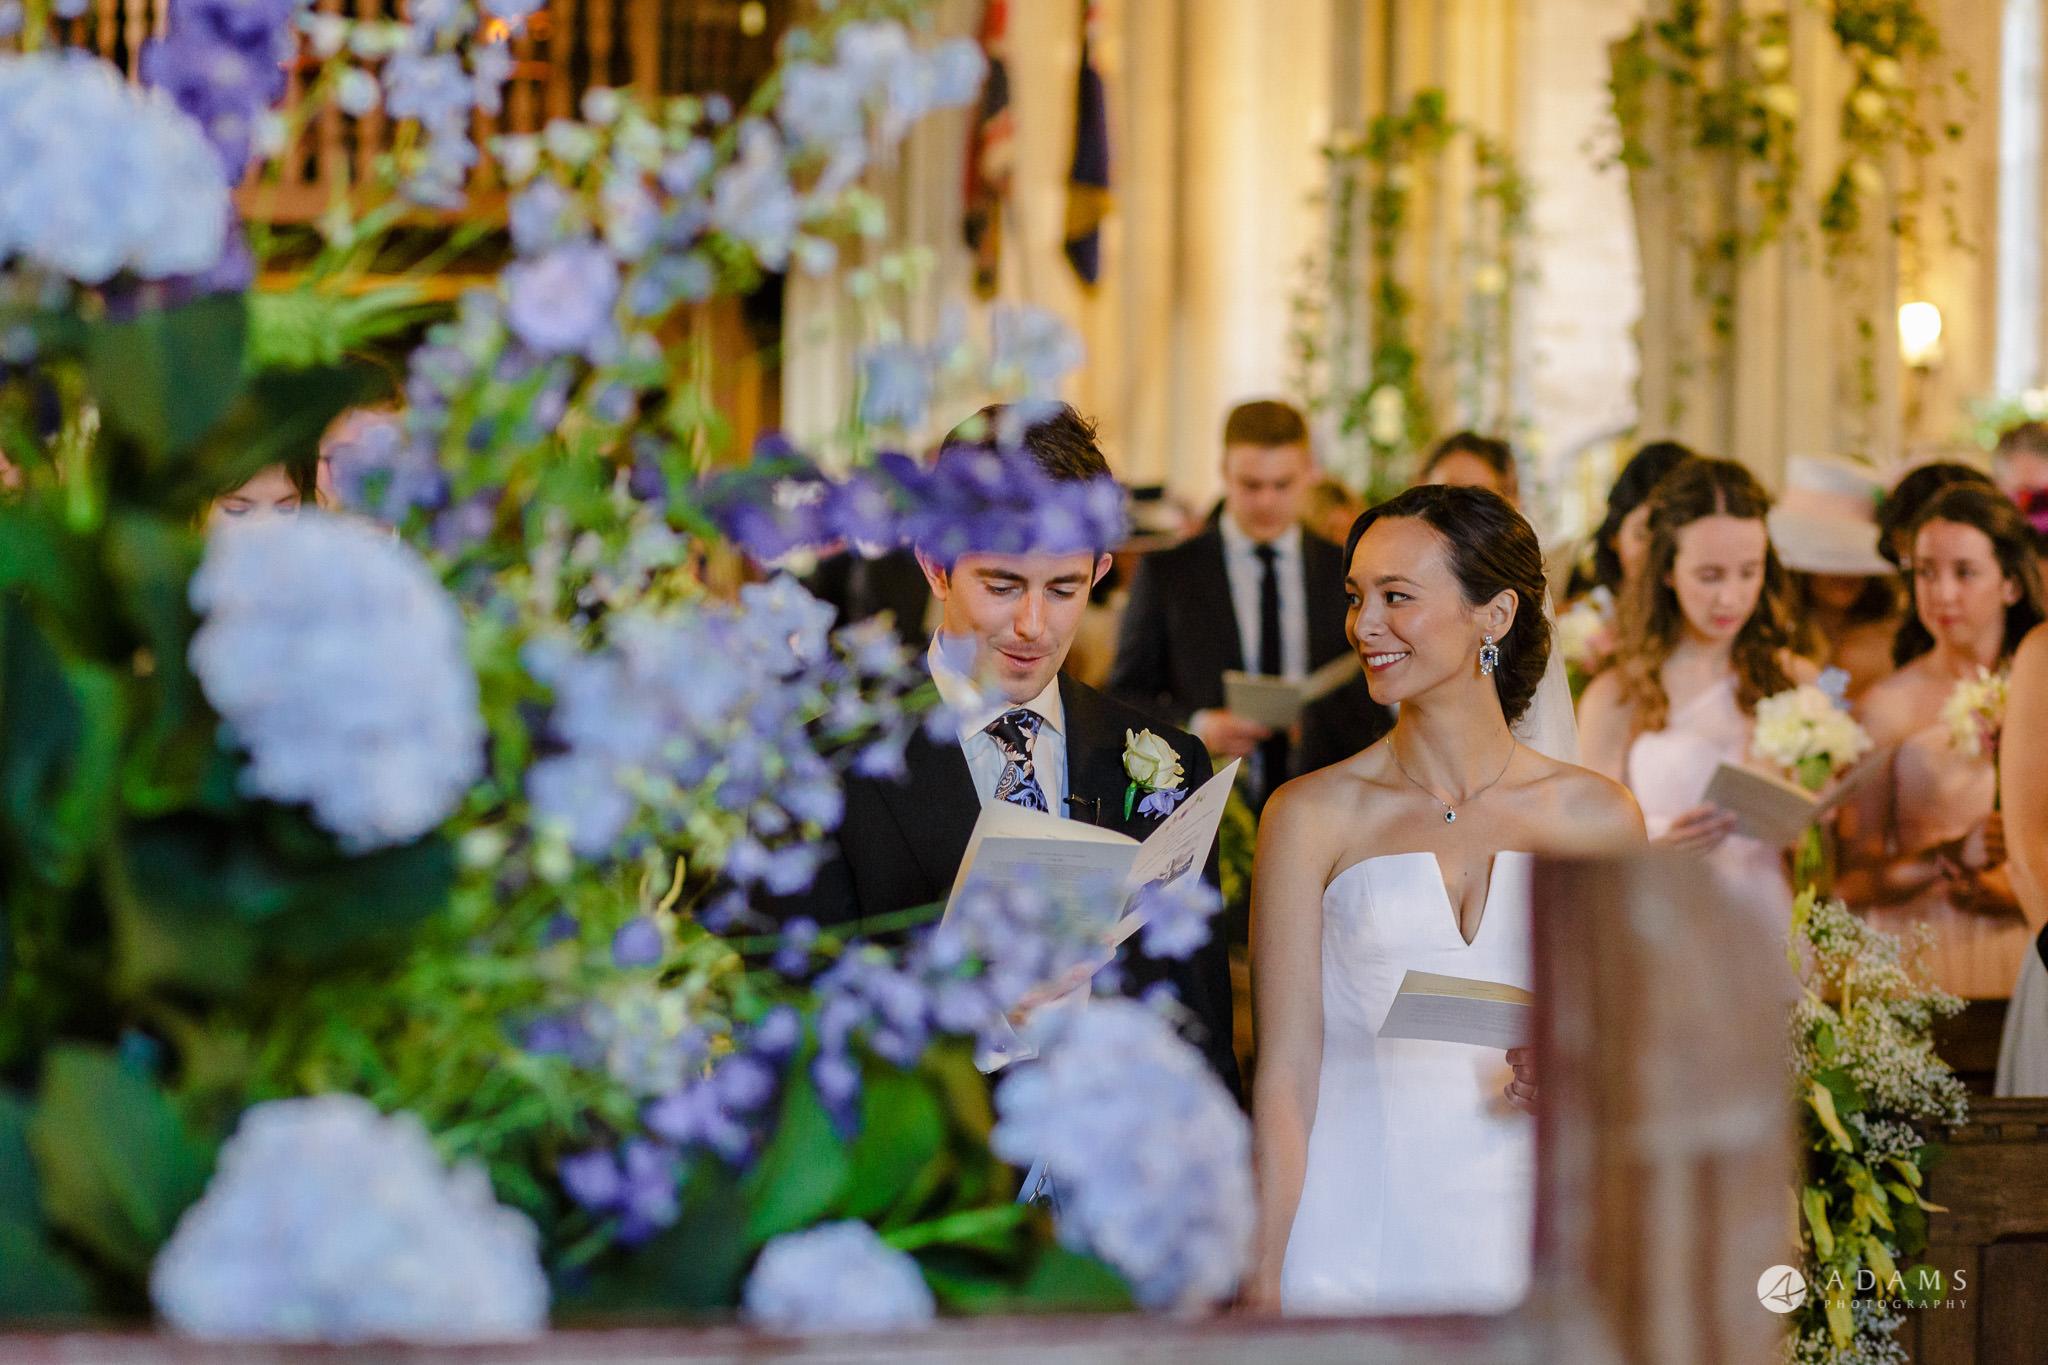 Trinity College Cambridge wedding bride looks at groom during ceremony